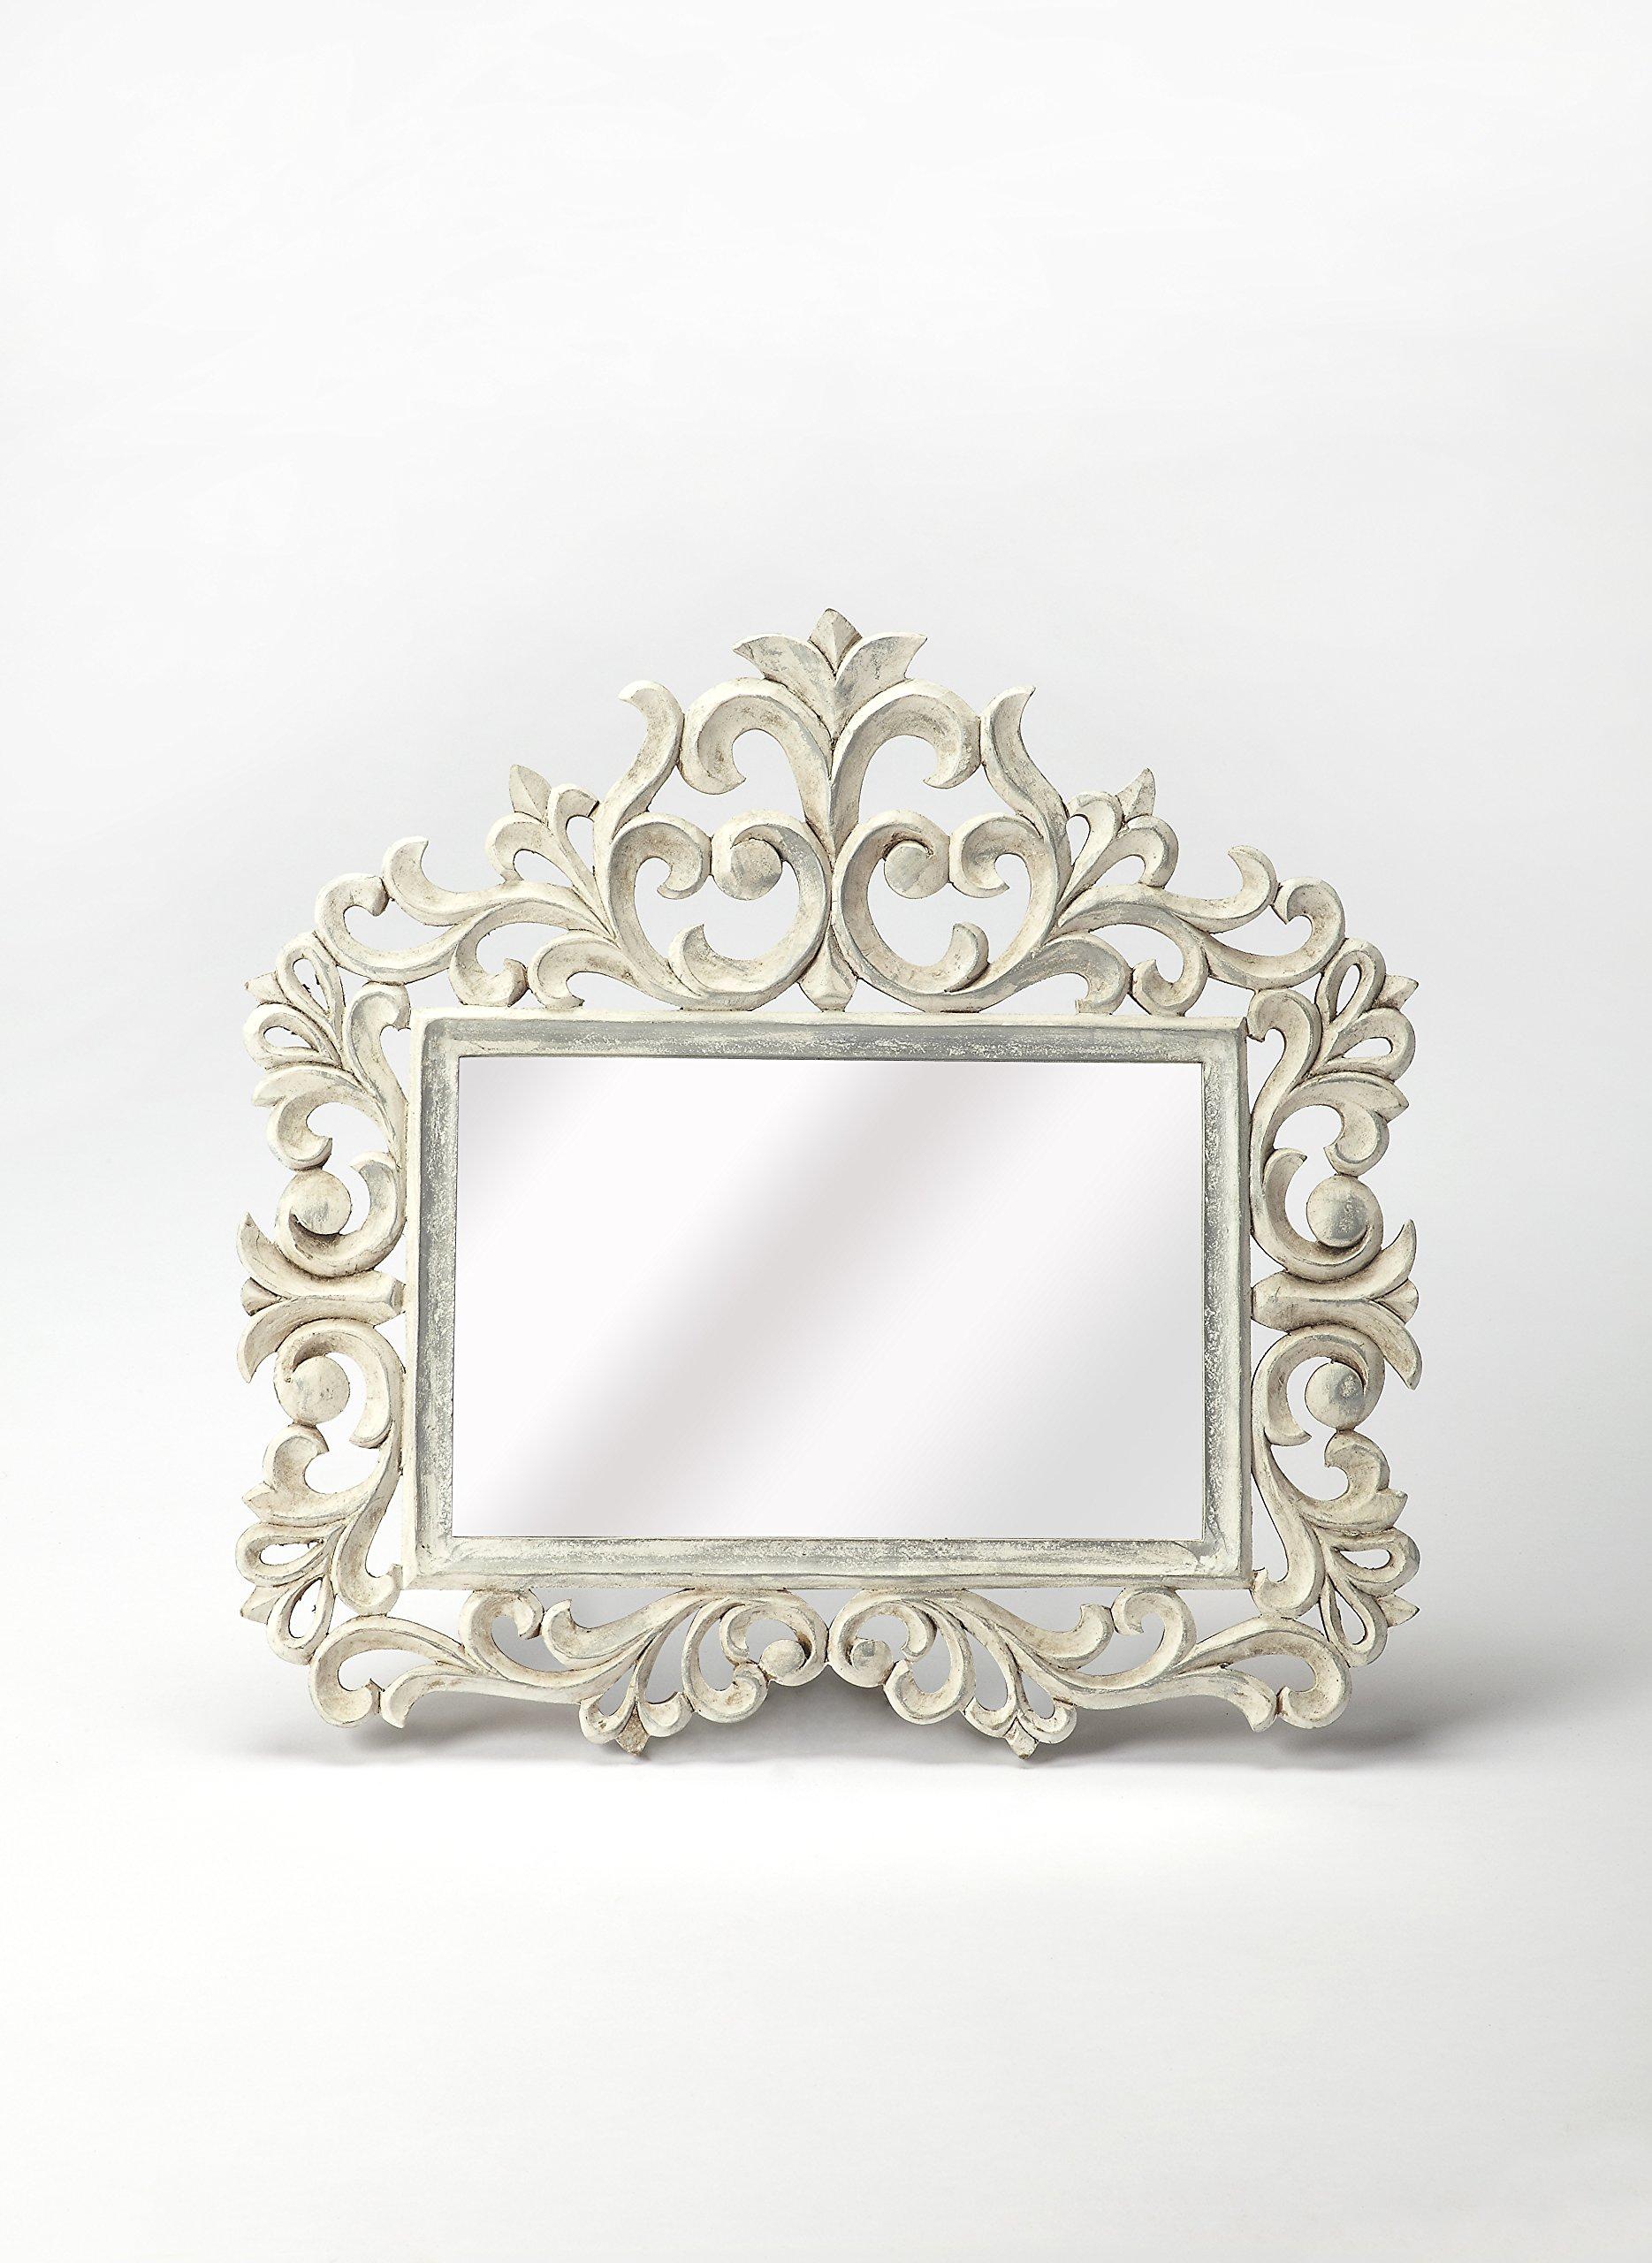 WOYBR 3681290 Wall Mirror